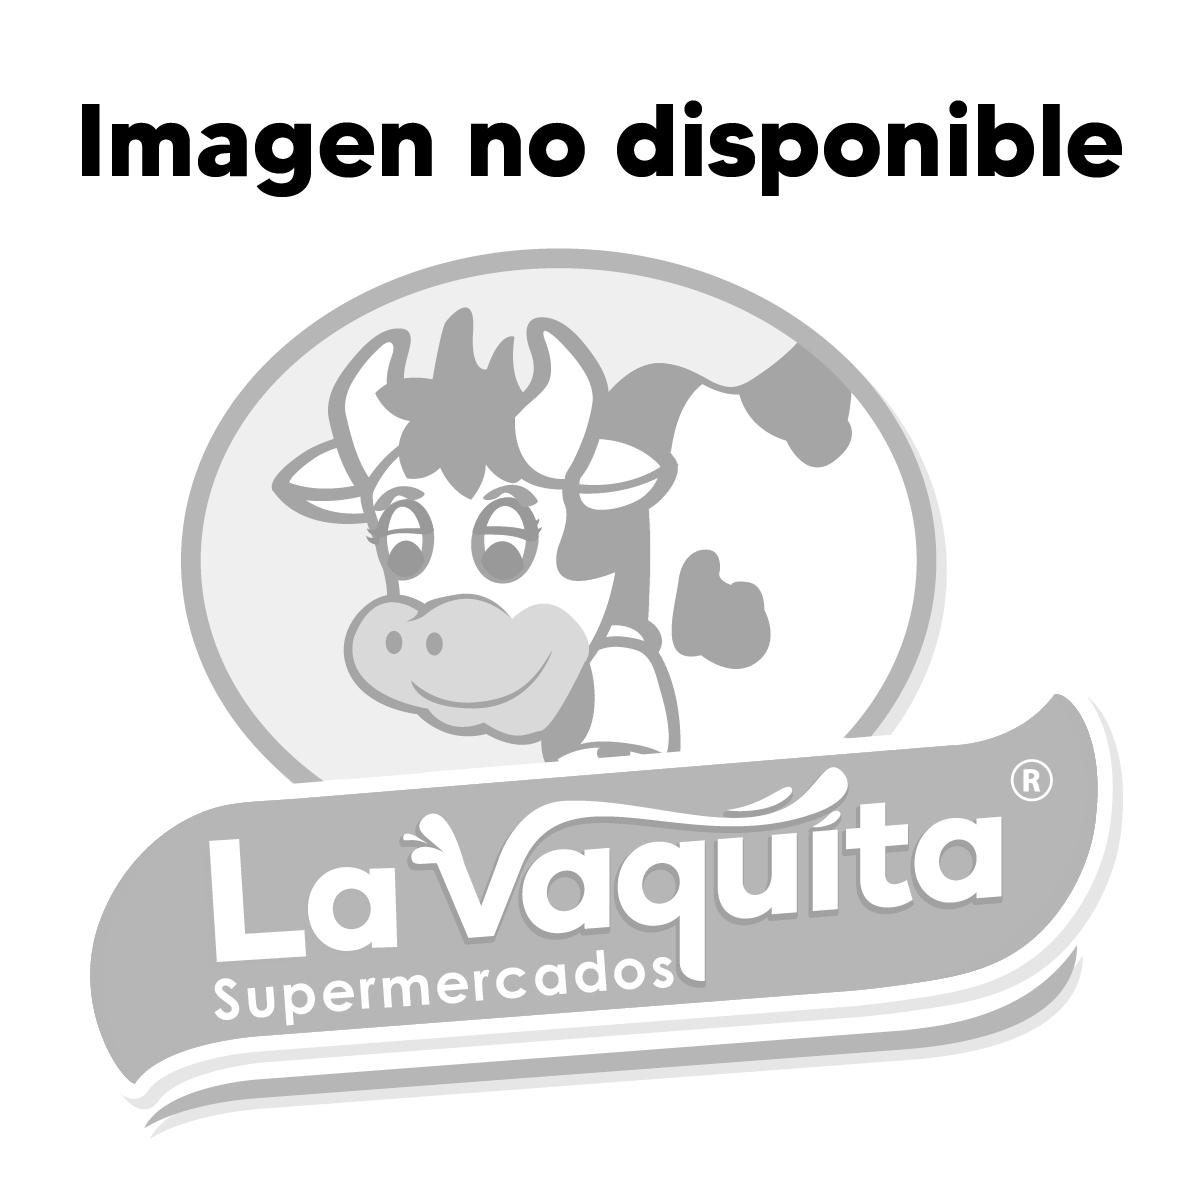 TOALLA COCINA VAQUITA 3U 50H N/IMAGEN